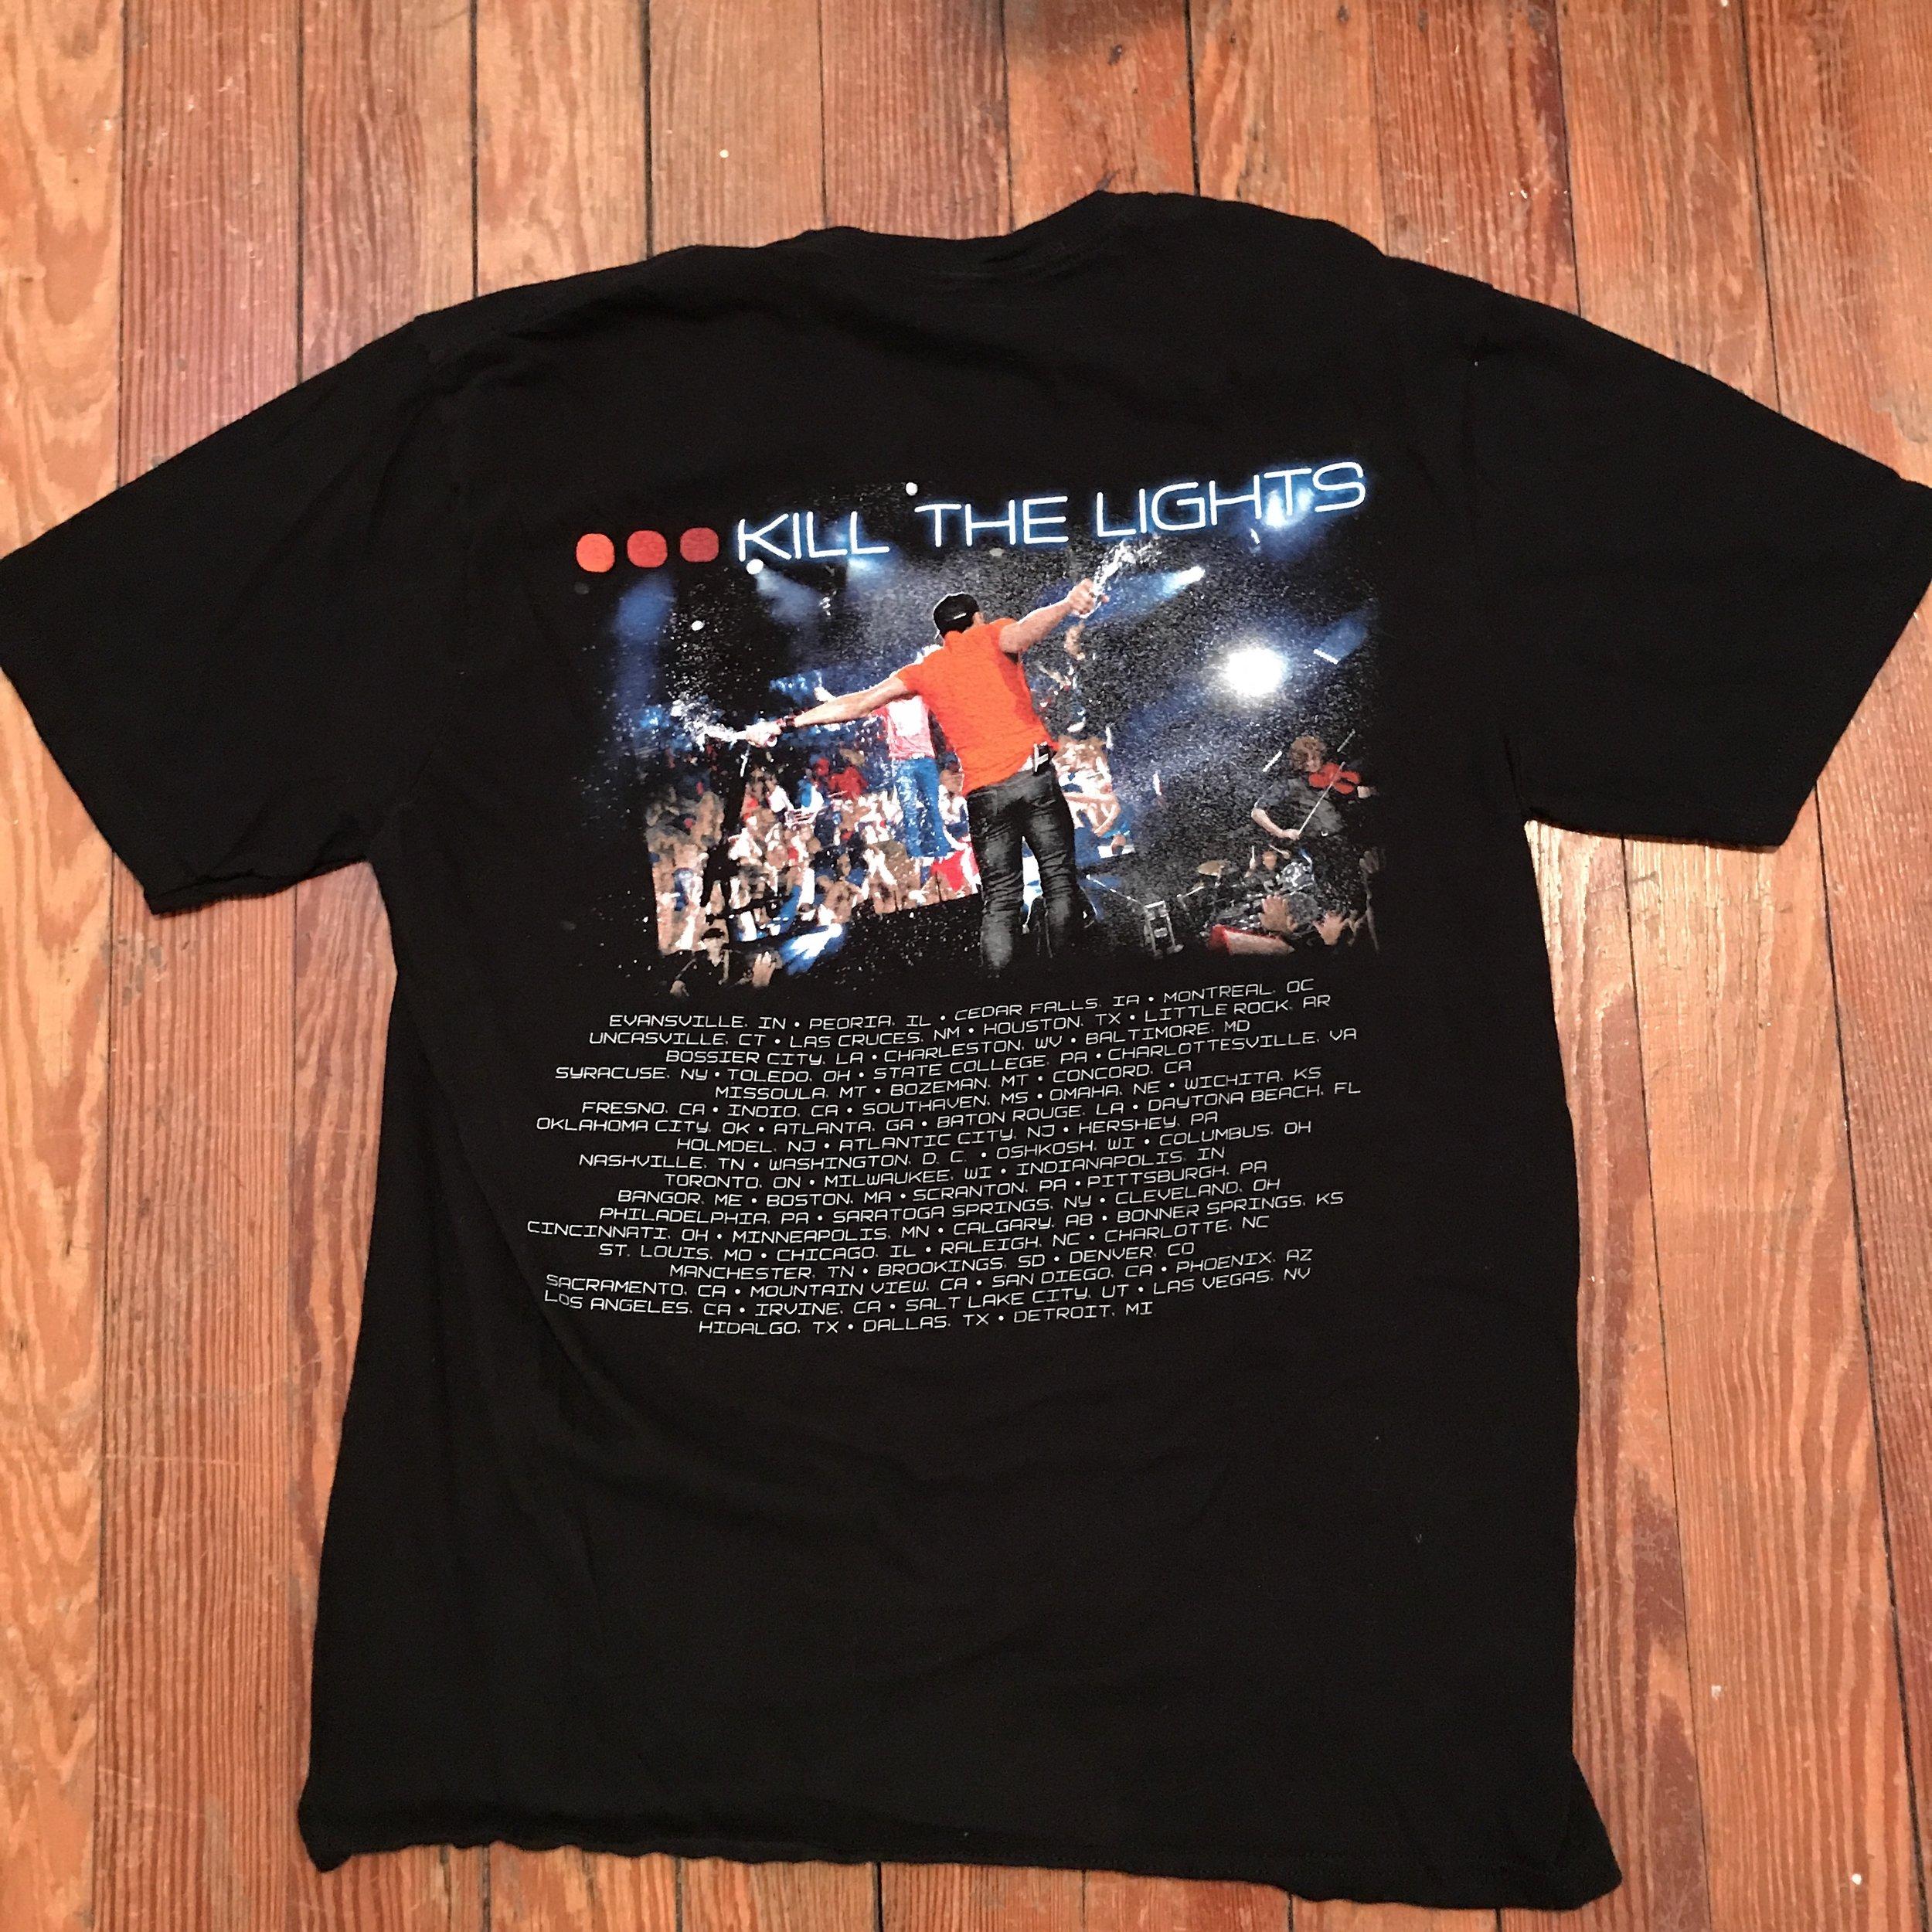 Luke Bryan Concert t-shirt